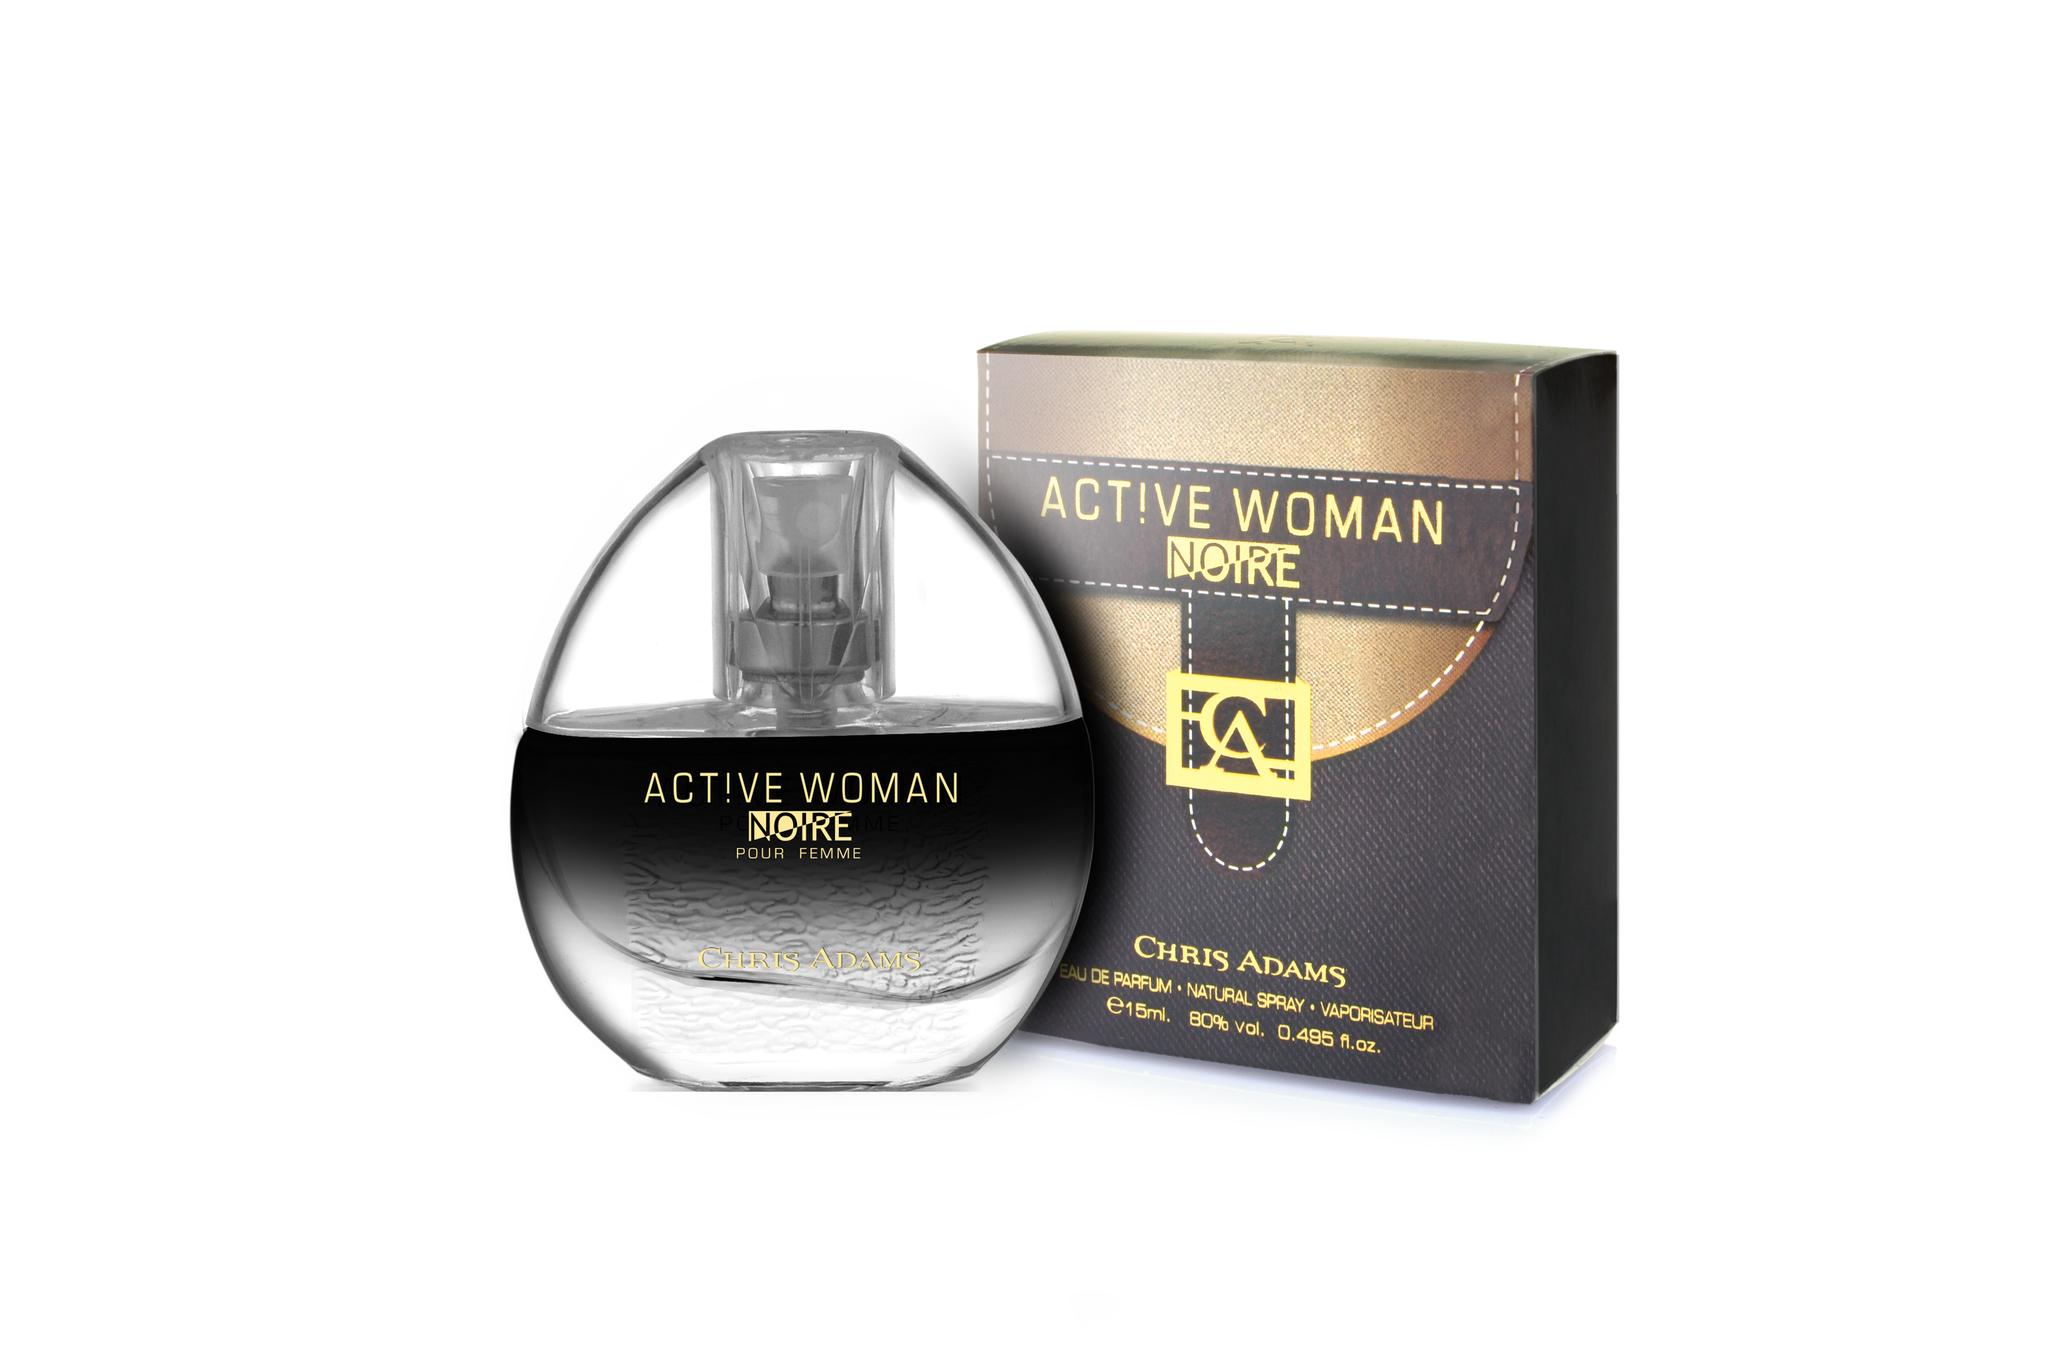 Chris Adams Женский Active Noire Woman Парфюмерная вода 15 мл